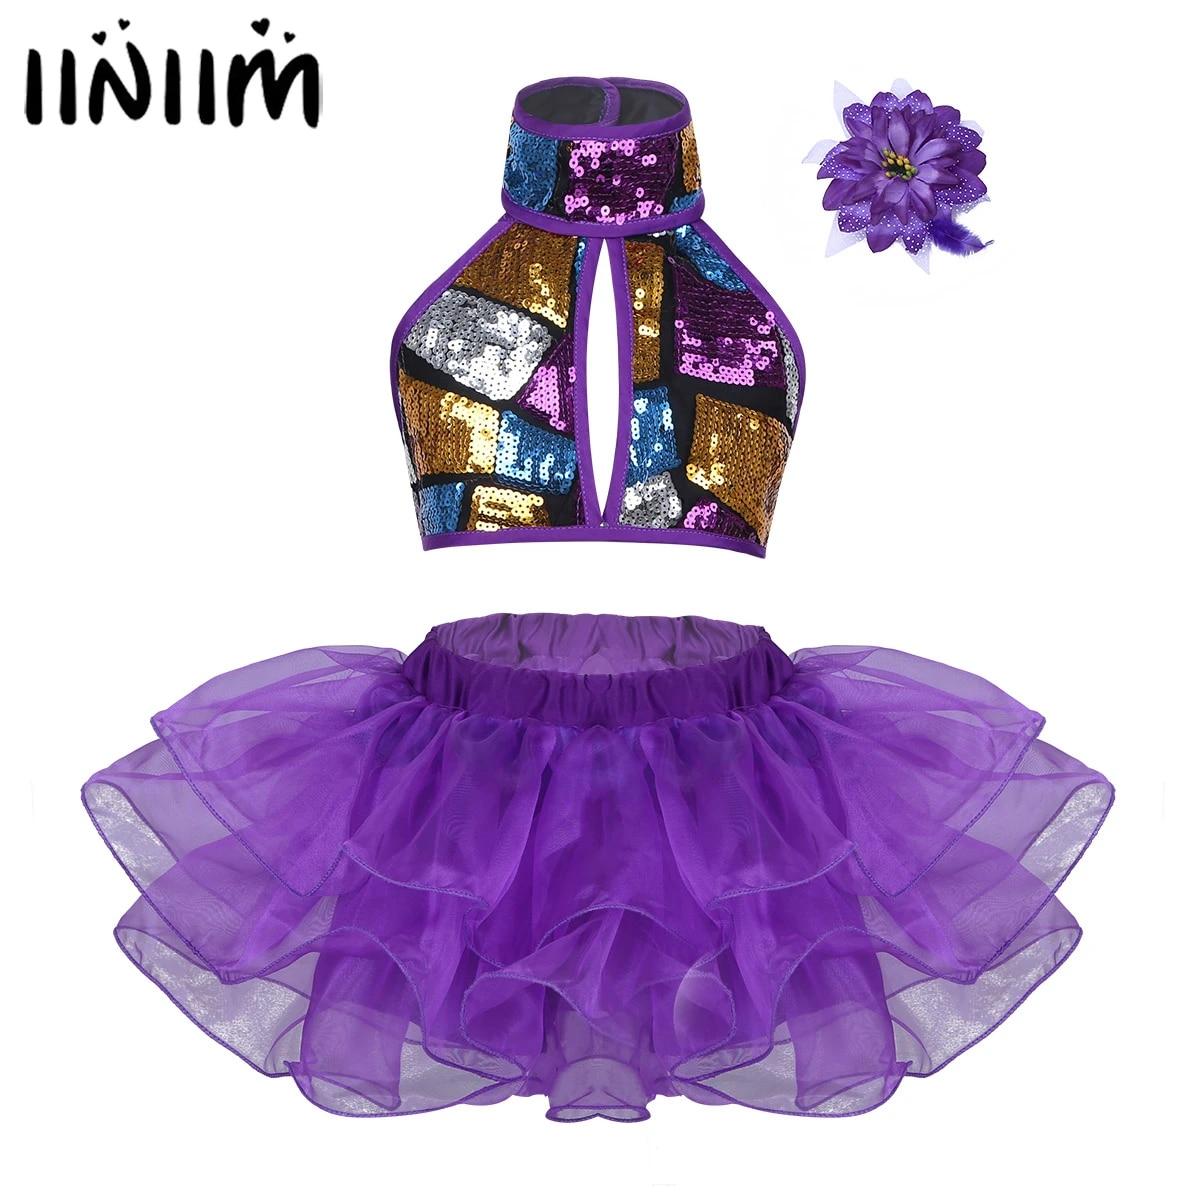 iiniim Girls Sequined Crop Top with Tutu Skirt Hair Clip Costume Kids Choir Jazz Dance Stage Performance Fancy Dress Up